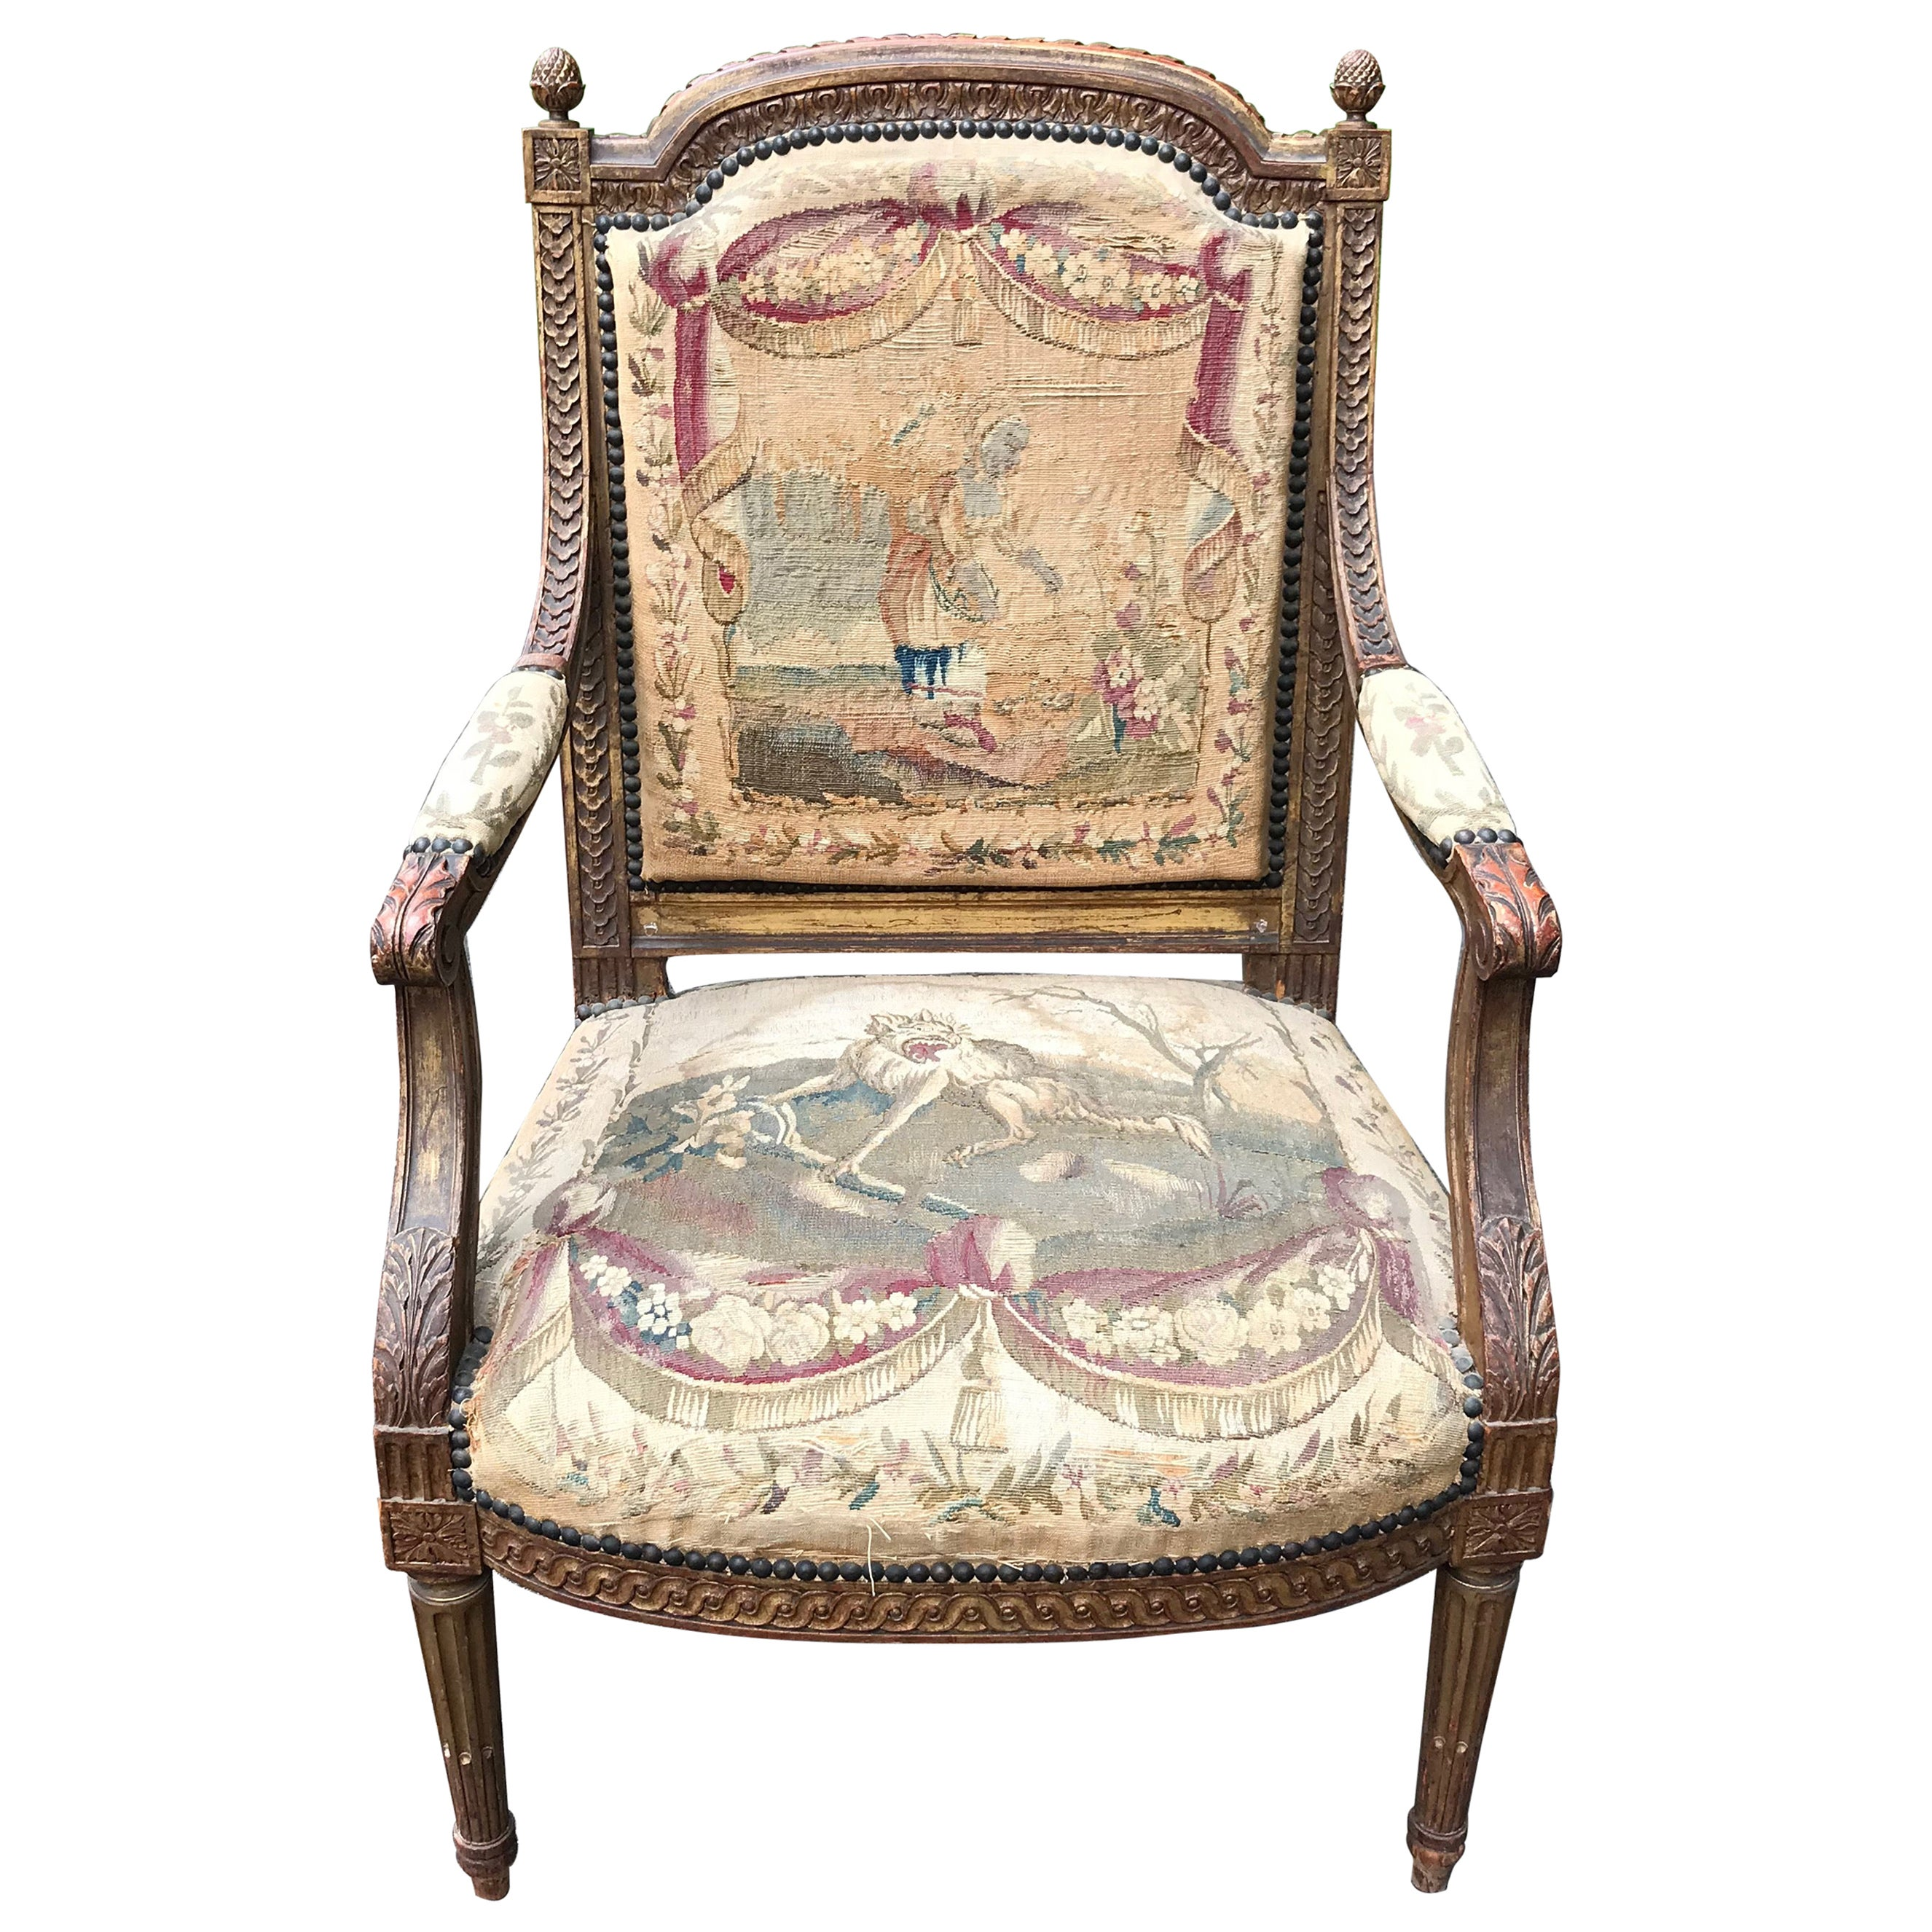 Set of 4, 19th Century French Louis XVI Fauteuils